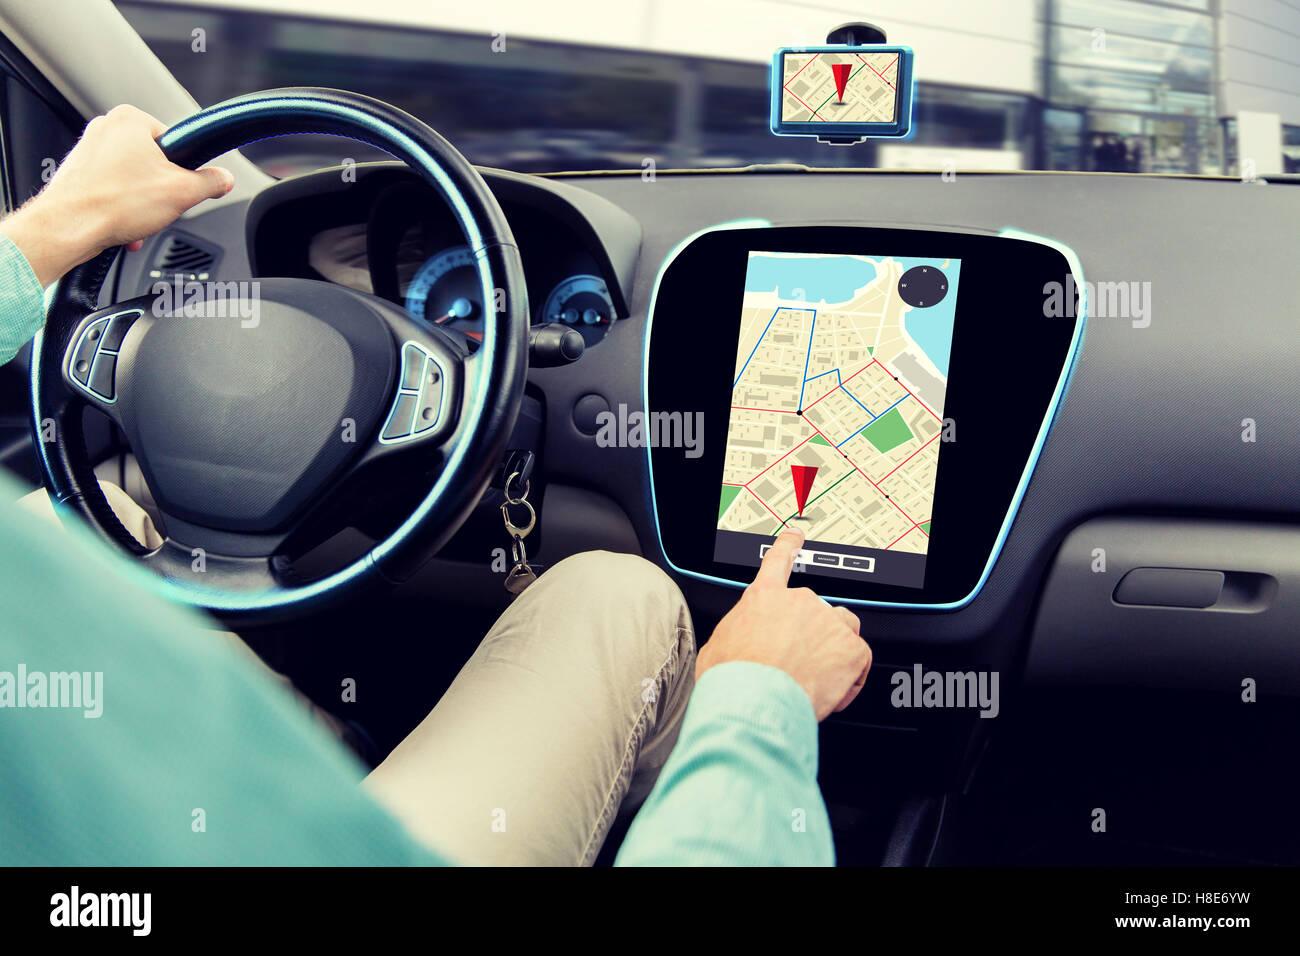 close up of man driving car and using navigator - Stock Image